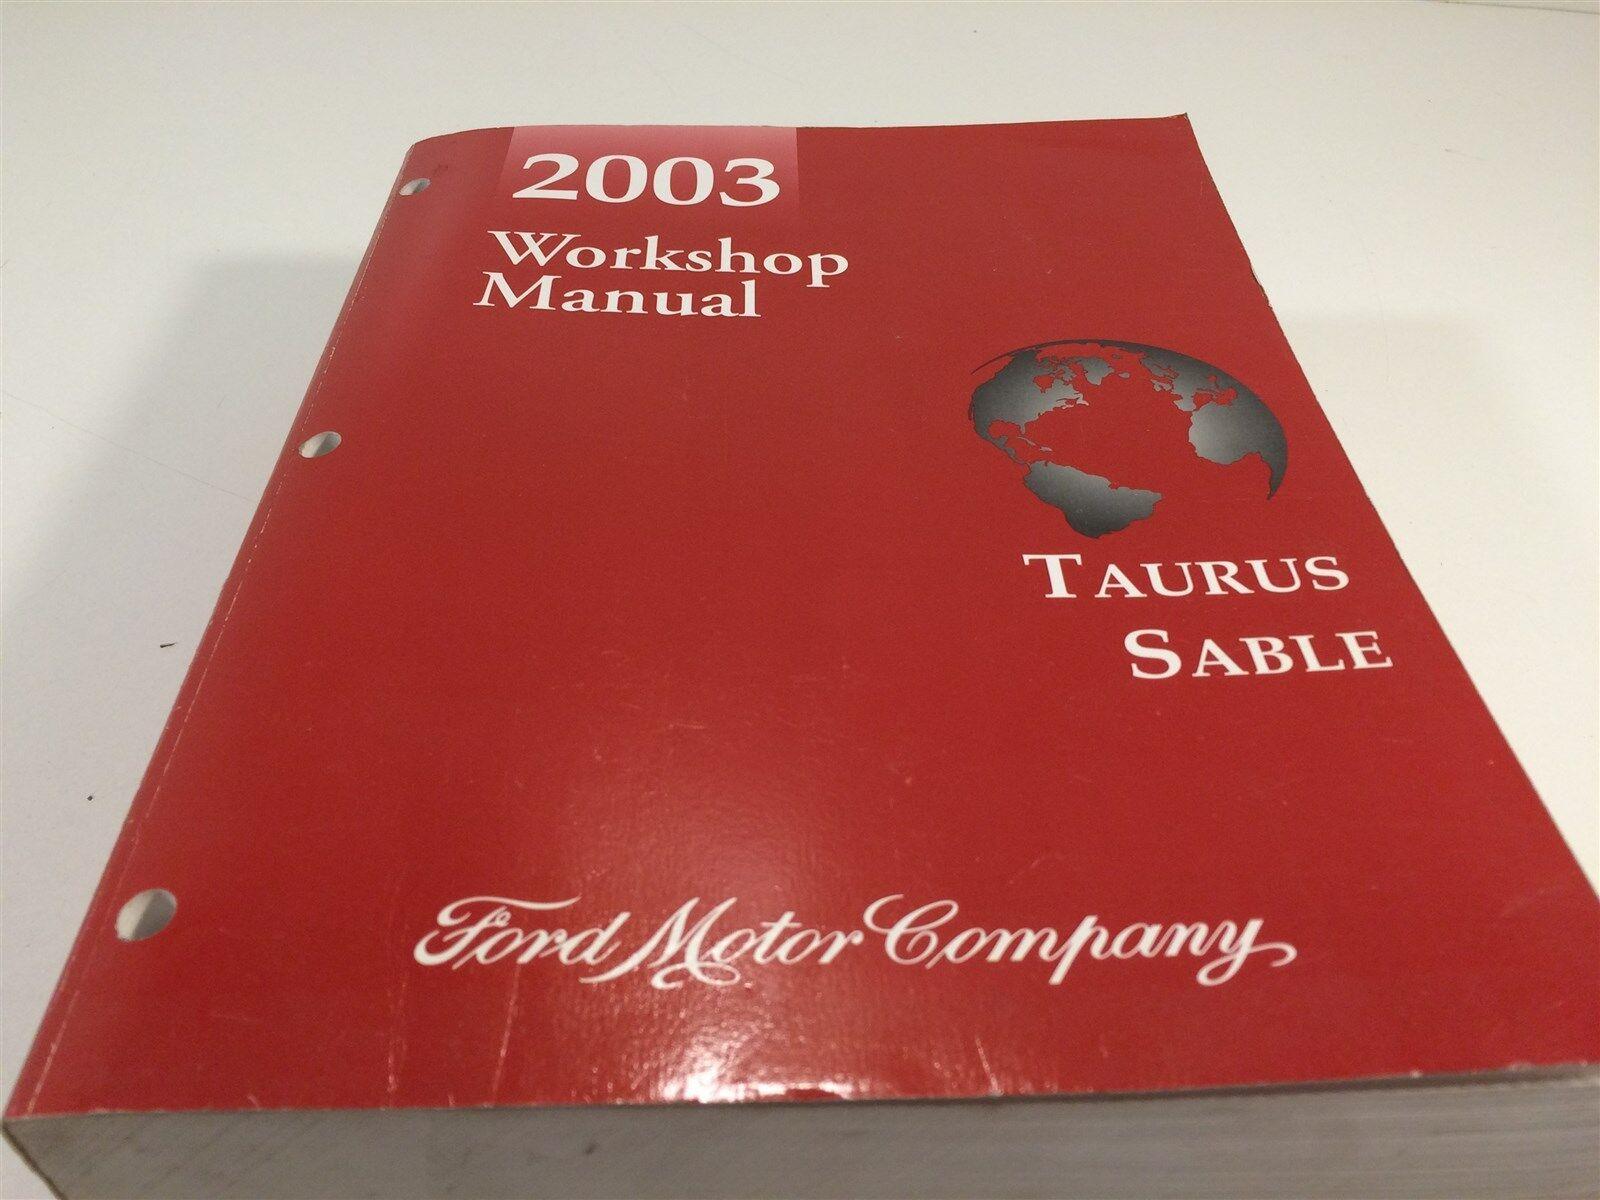 2003 ford taurus sable workshop repair service manual ebay rh ebay com 2003 ford taurus repair manual pdf 2003 ford taurus ses repair manual